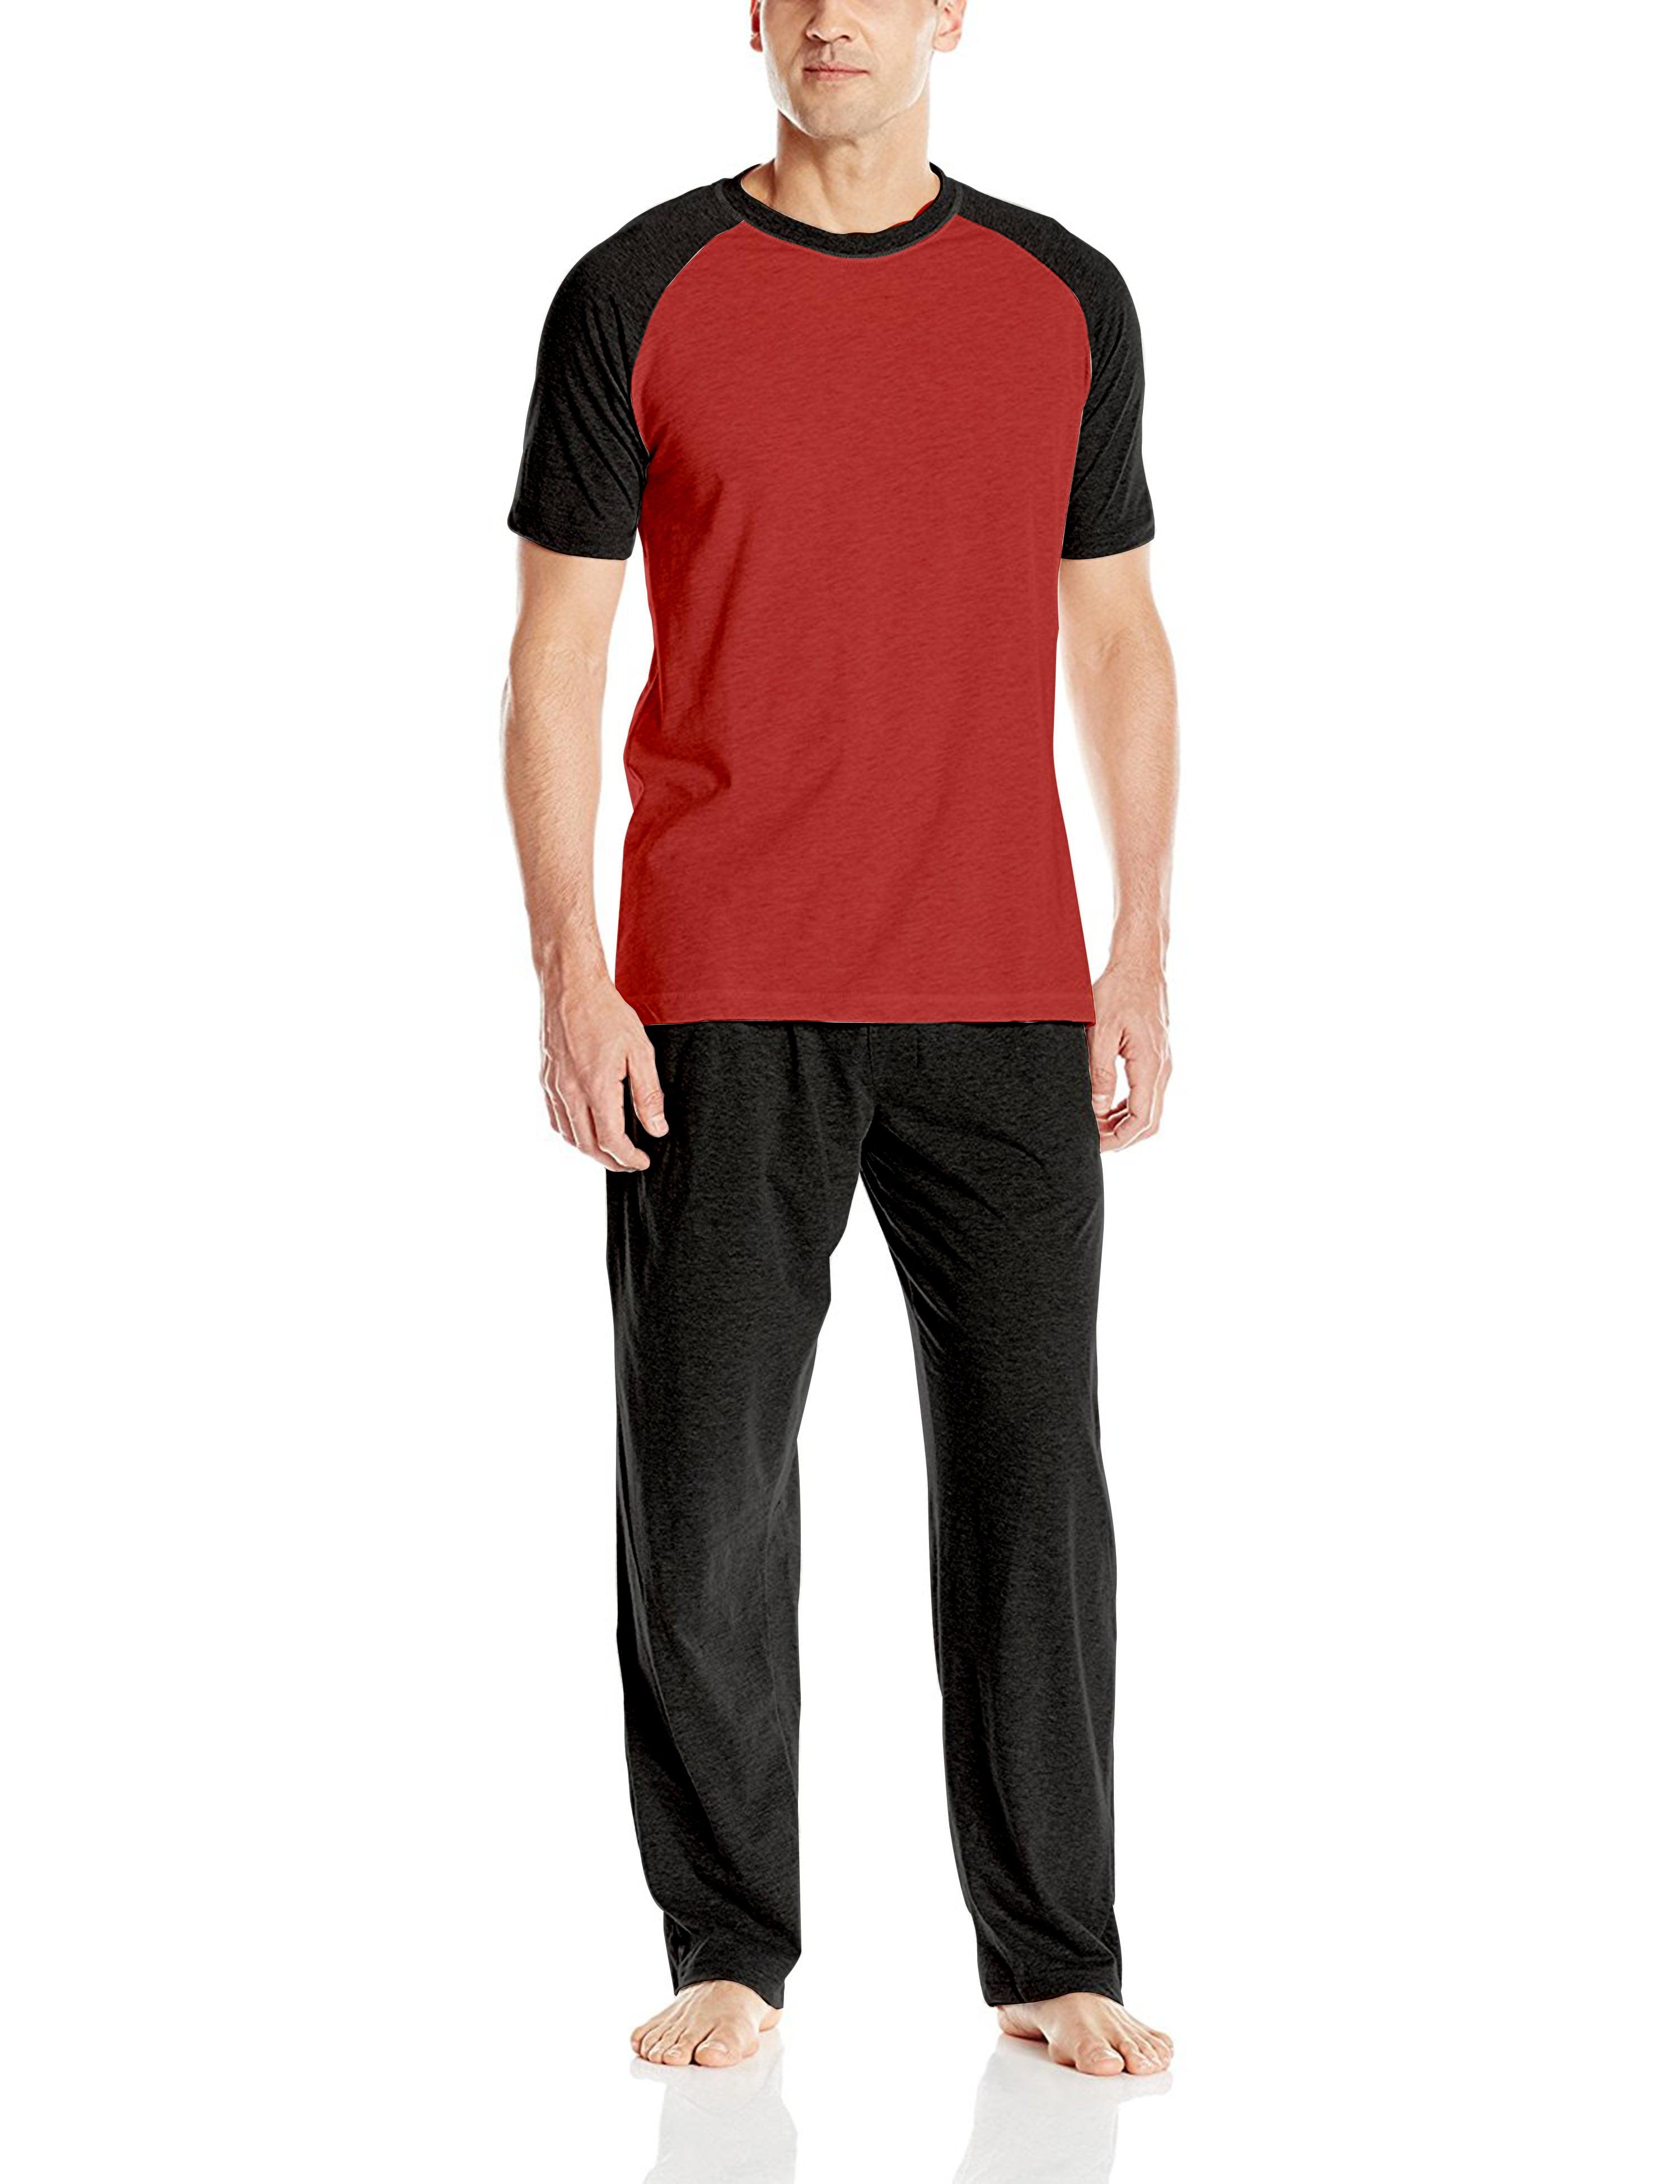 Hospital Pajama Shirt 6 ea Cotton Poly Medium Lt Blue Front Pocket Snap Closure